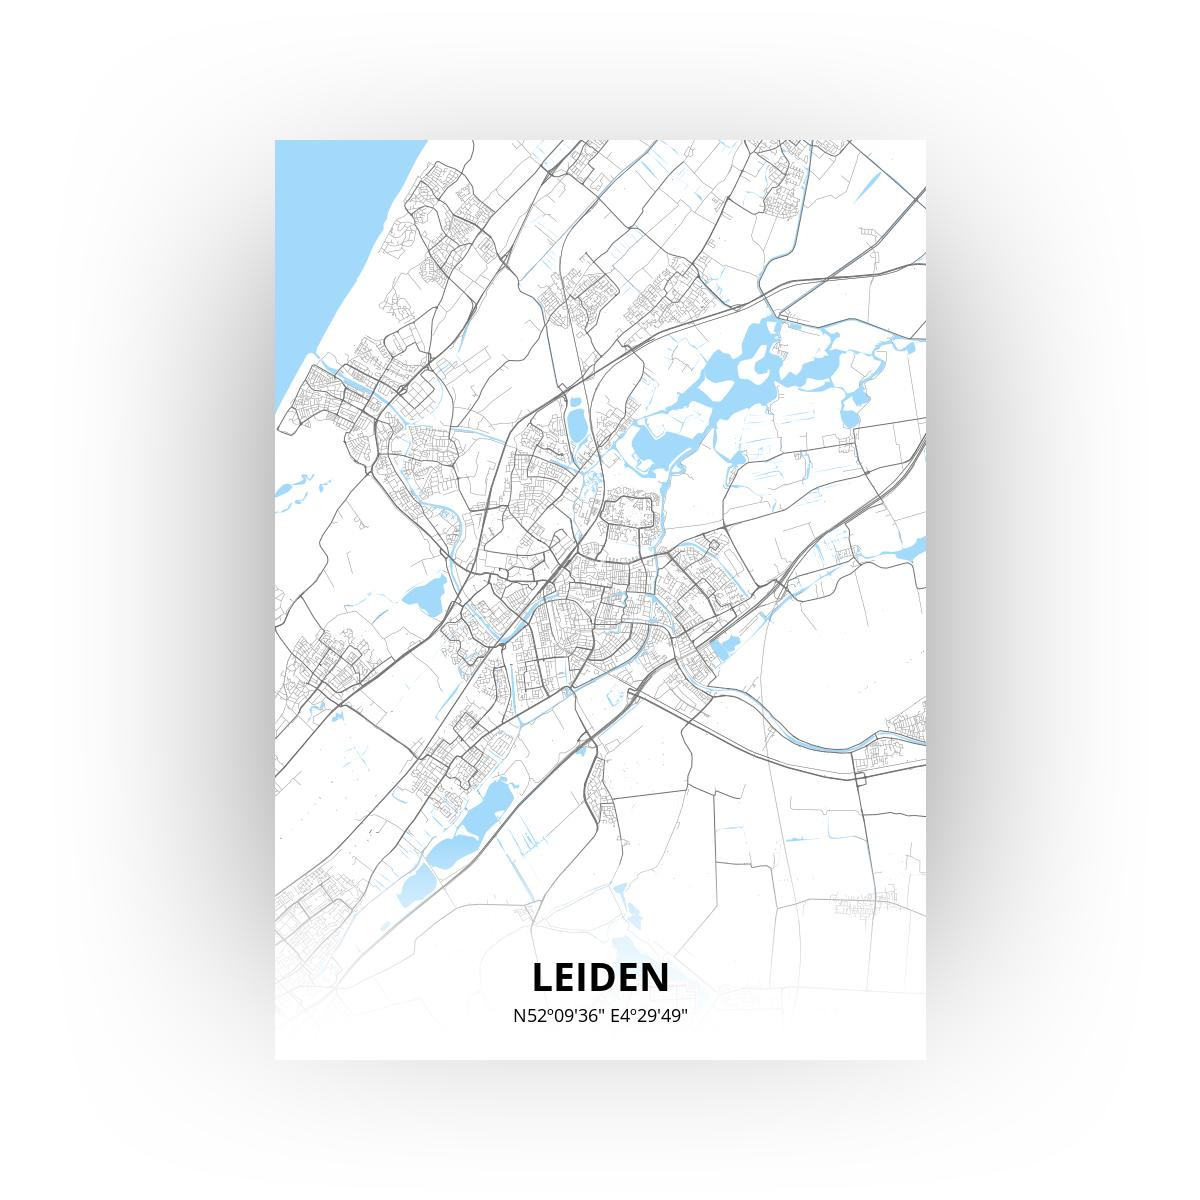 Leiden print - Standaard stijl